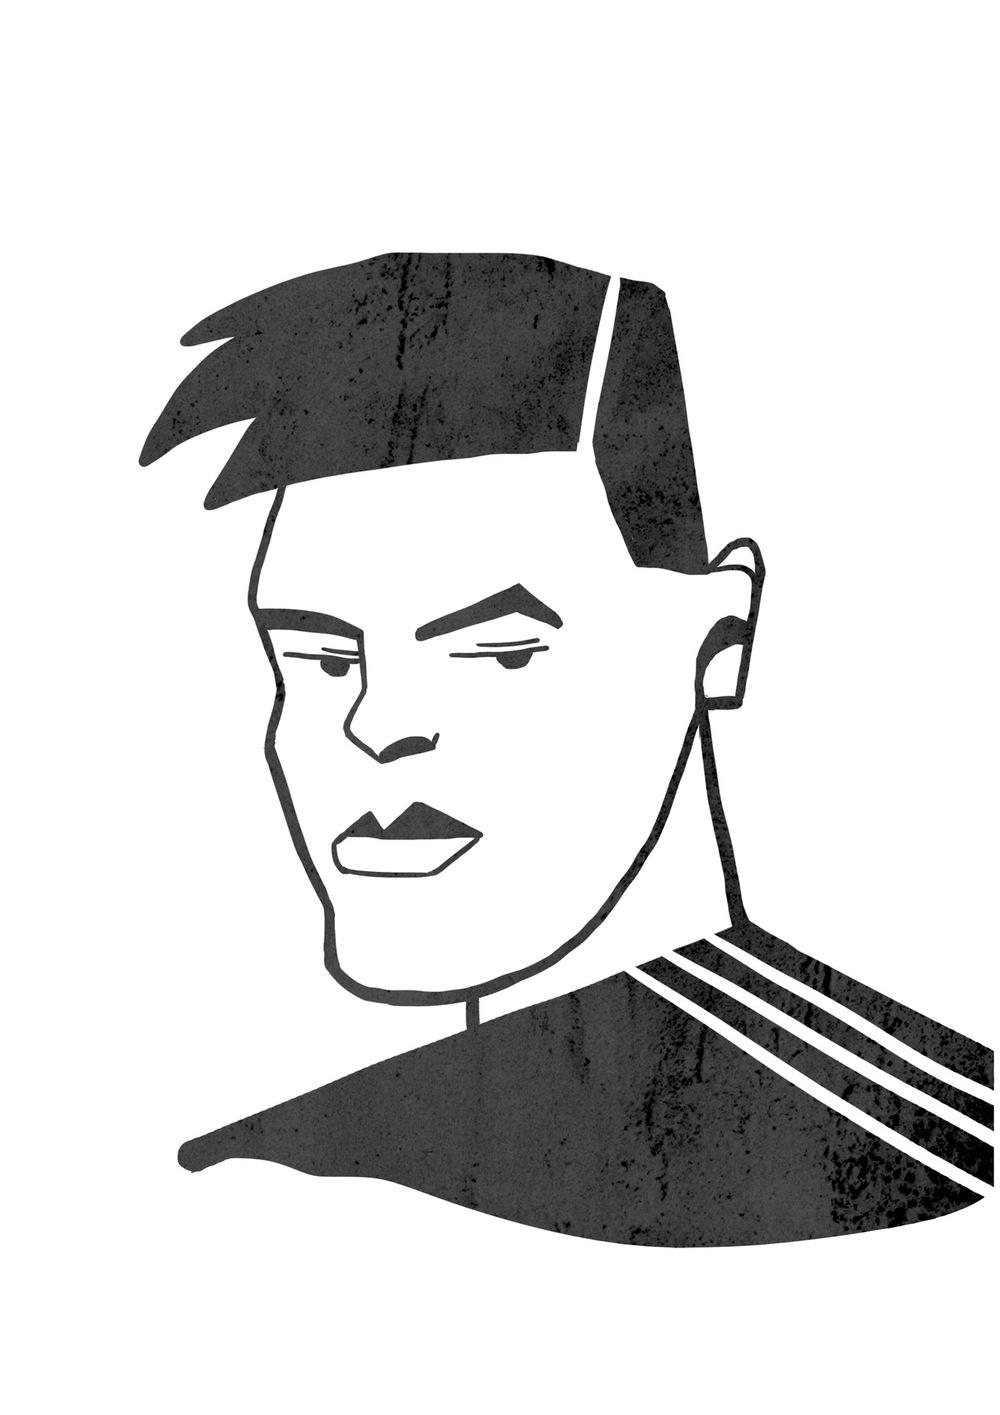 yevtushenko - Boy